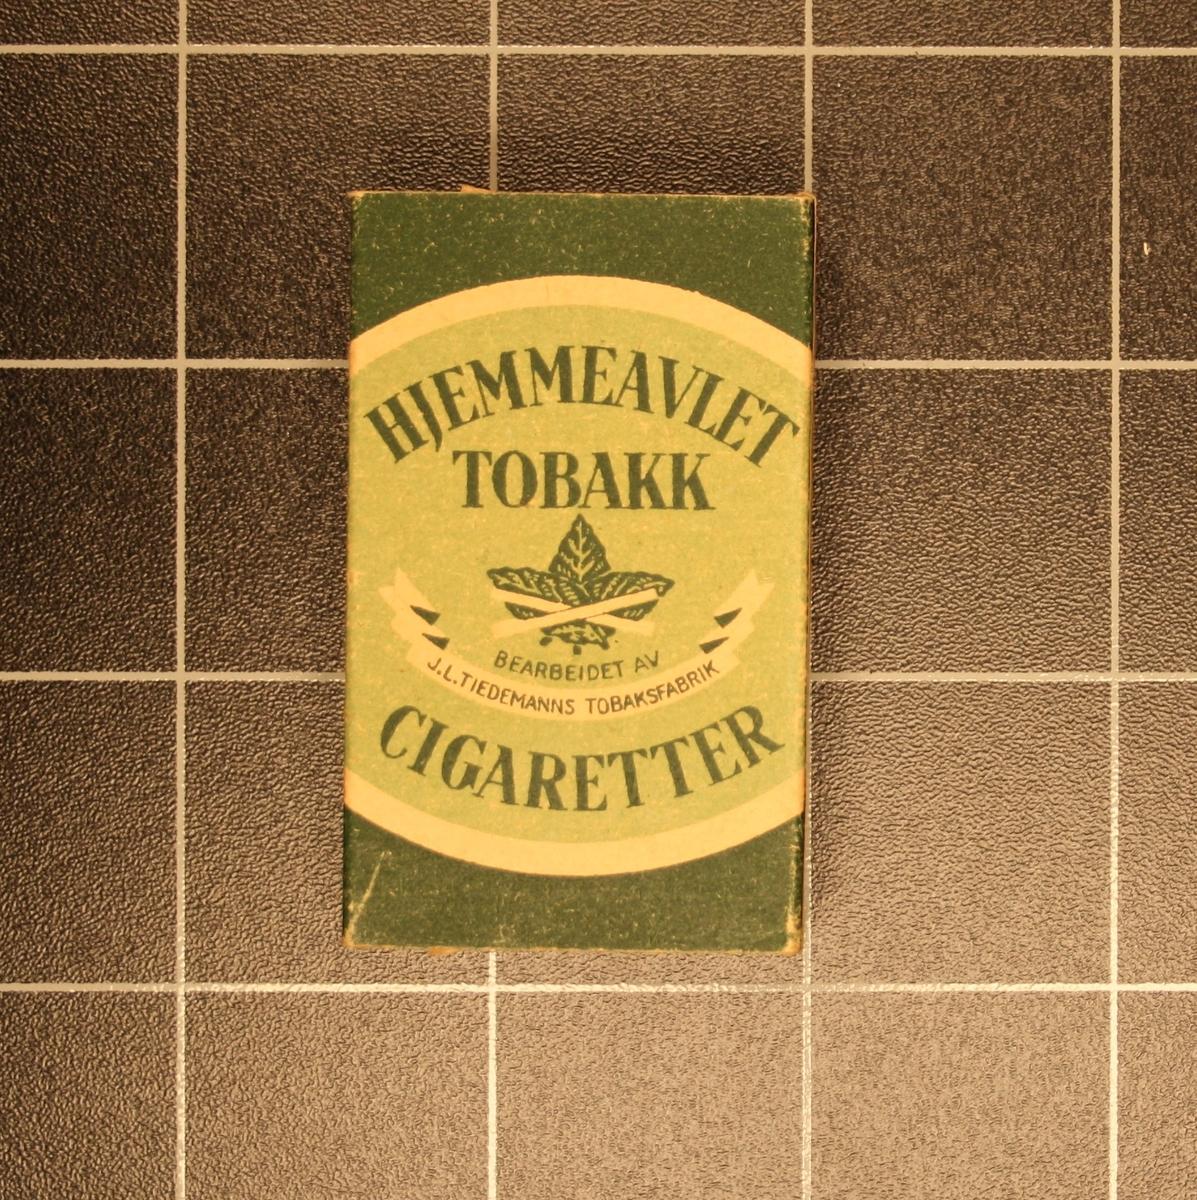 Form: Små rektangulære pappesker med Sigaretter to stk.